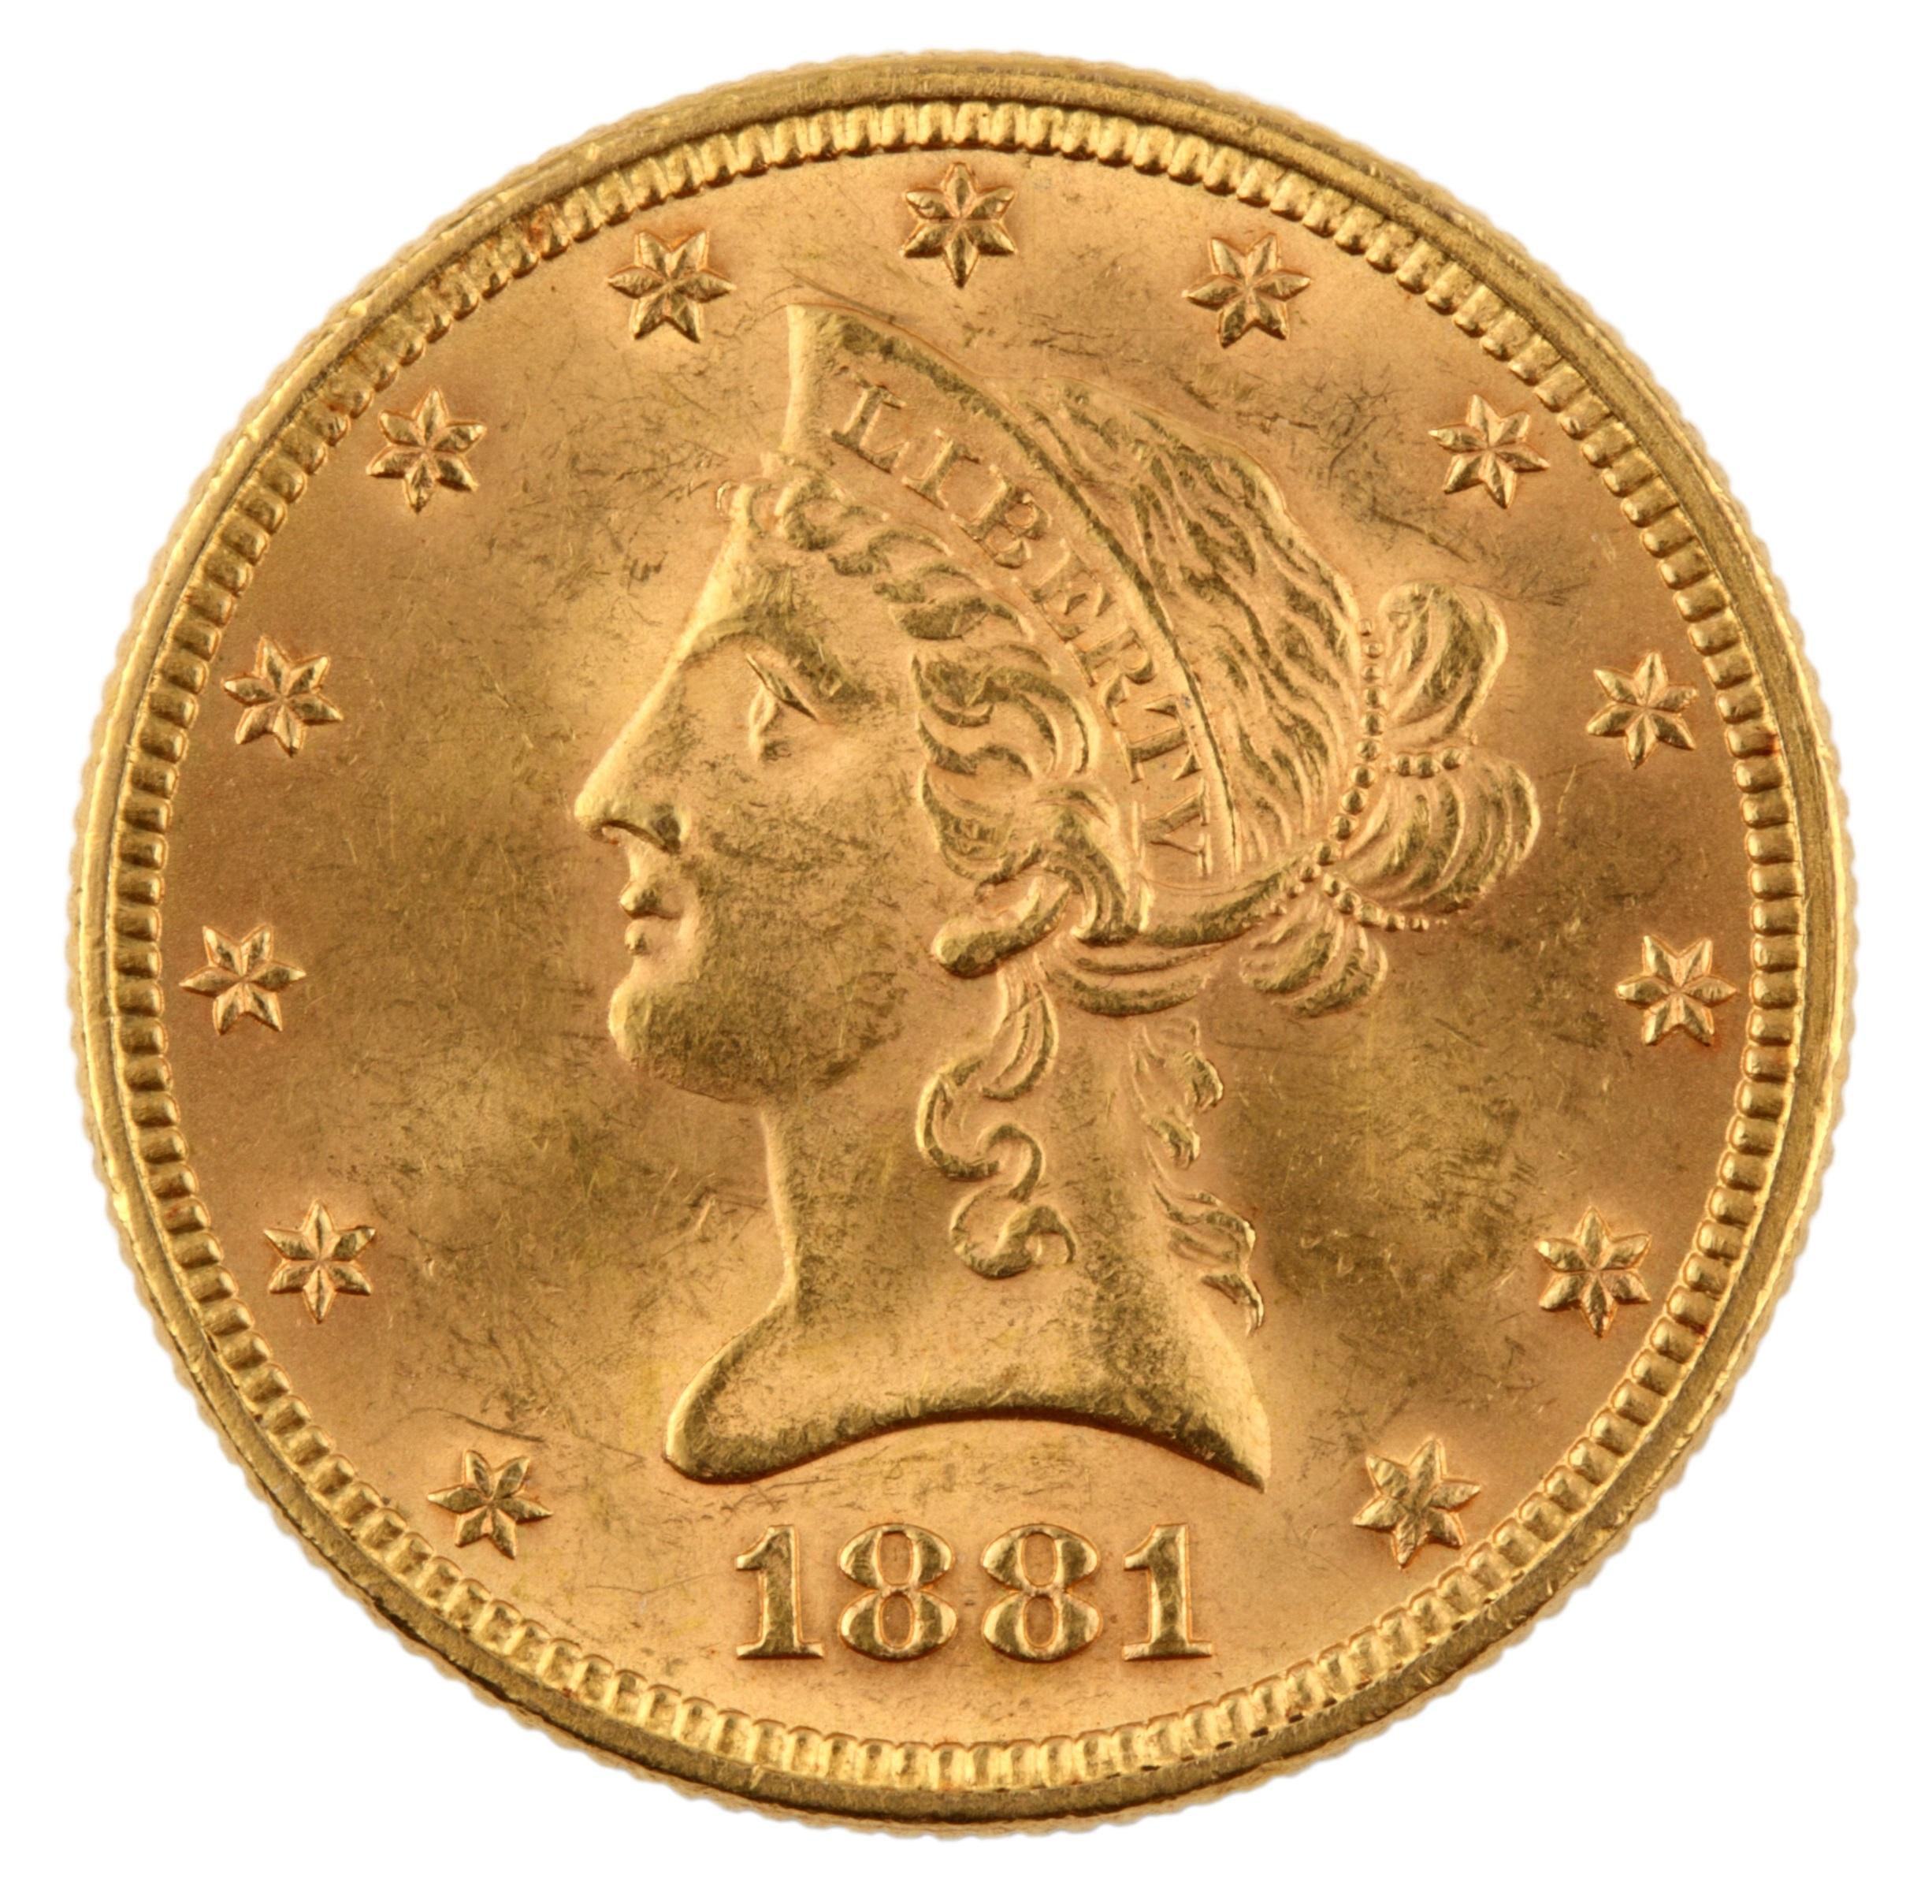 $10 Liberty Head 1838-1907